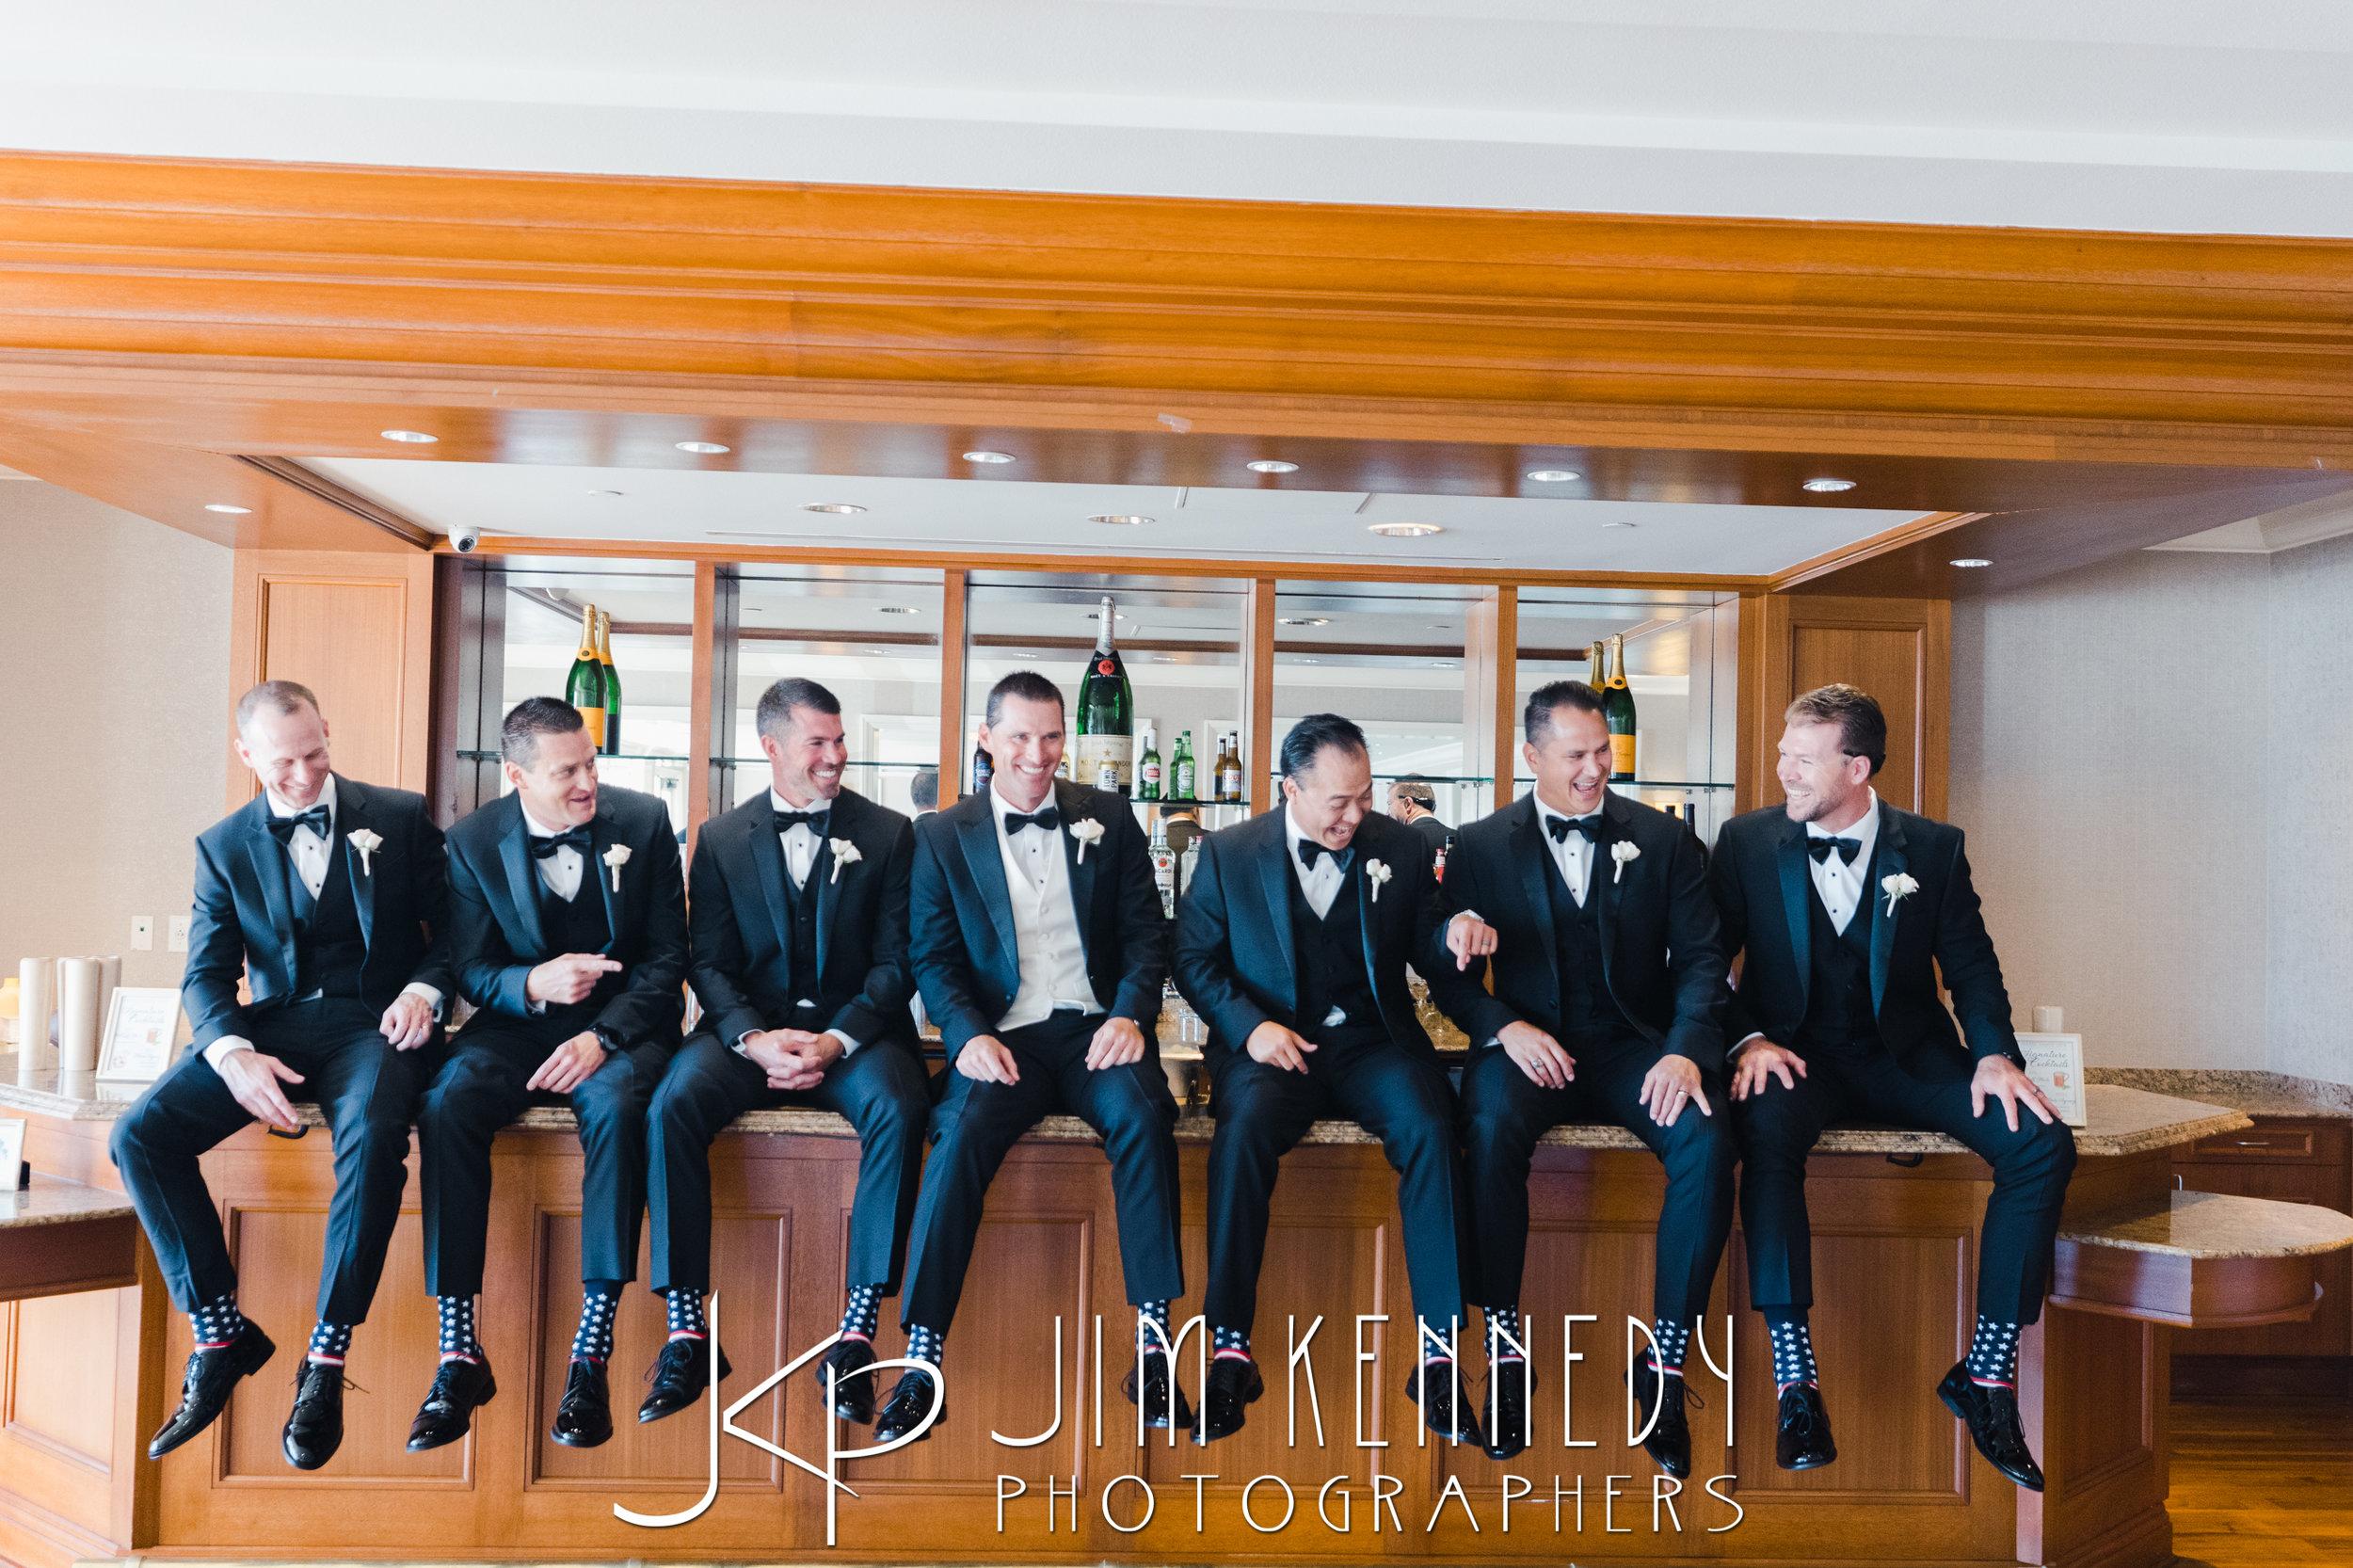 balboa-bay-resort-wedding-brooke-kevin_0069.JPG